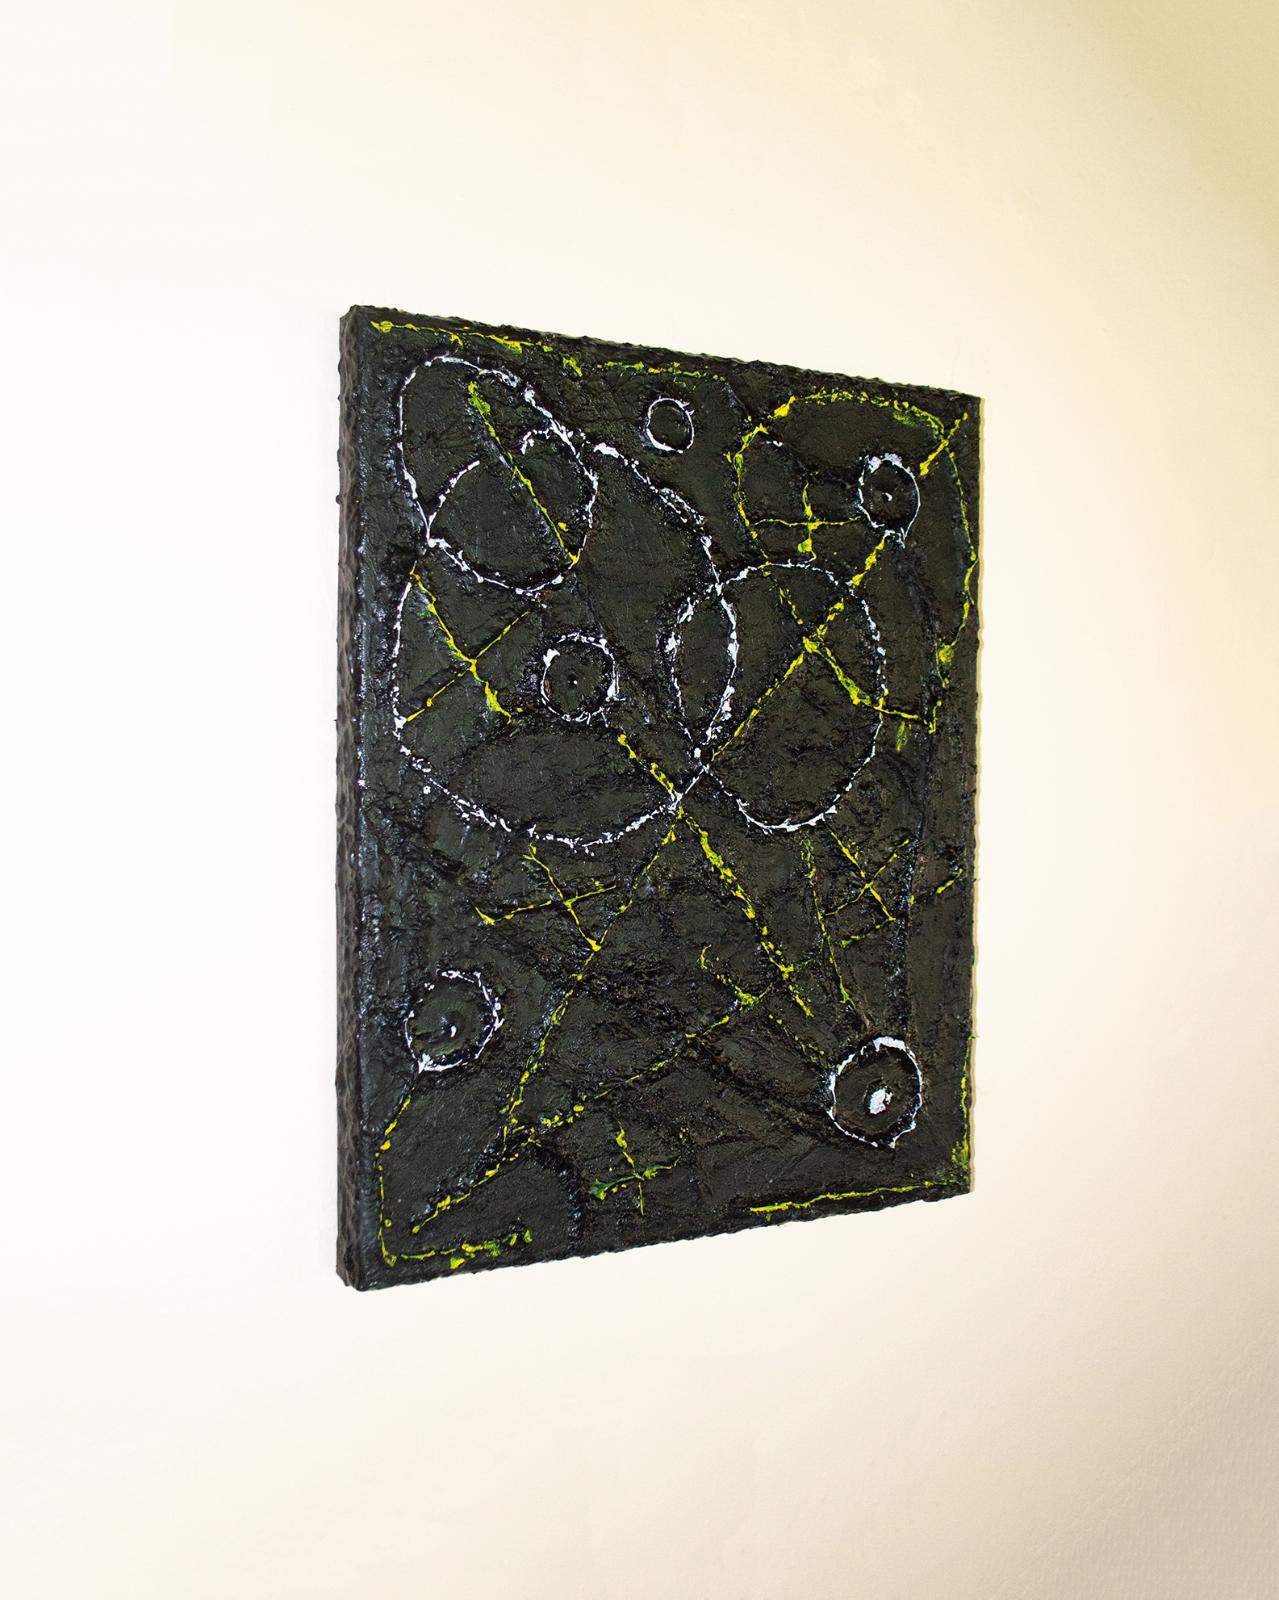 Original Art Painting XO Light Modern Abstract Acrylic On Canvas Painting - $600.00